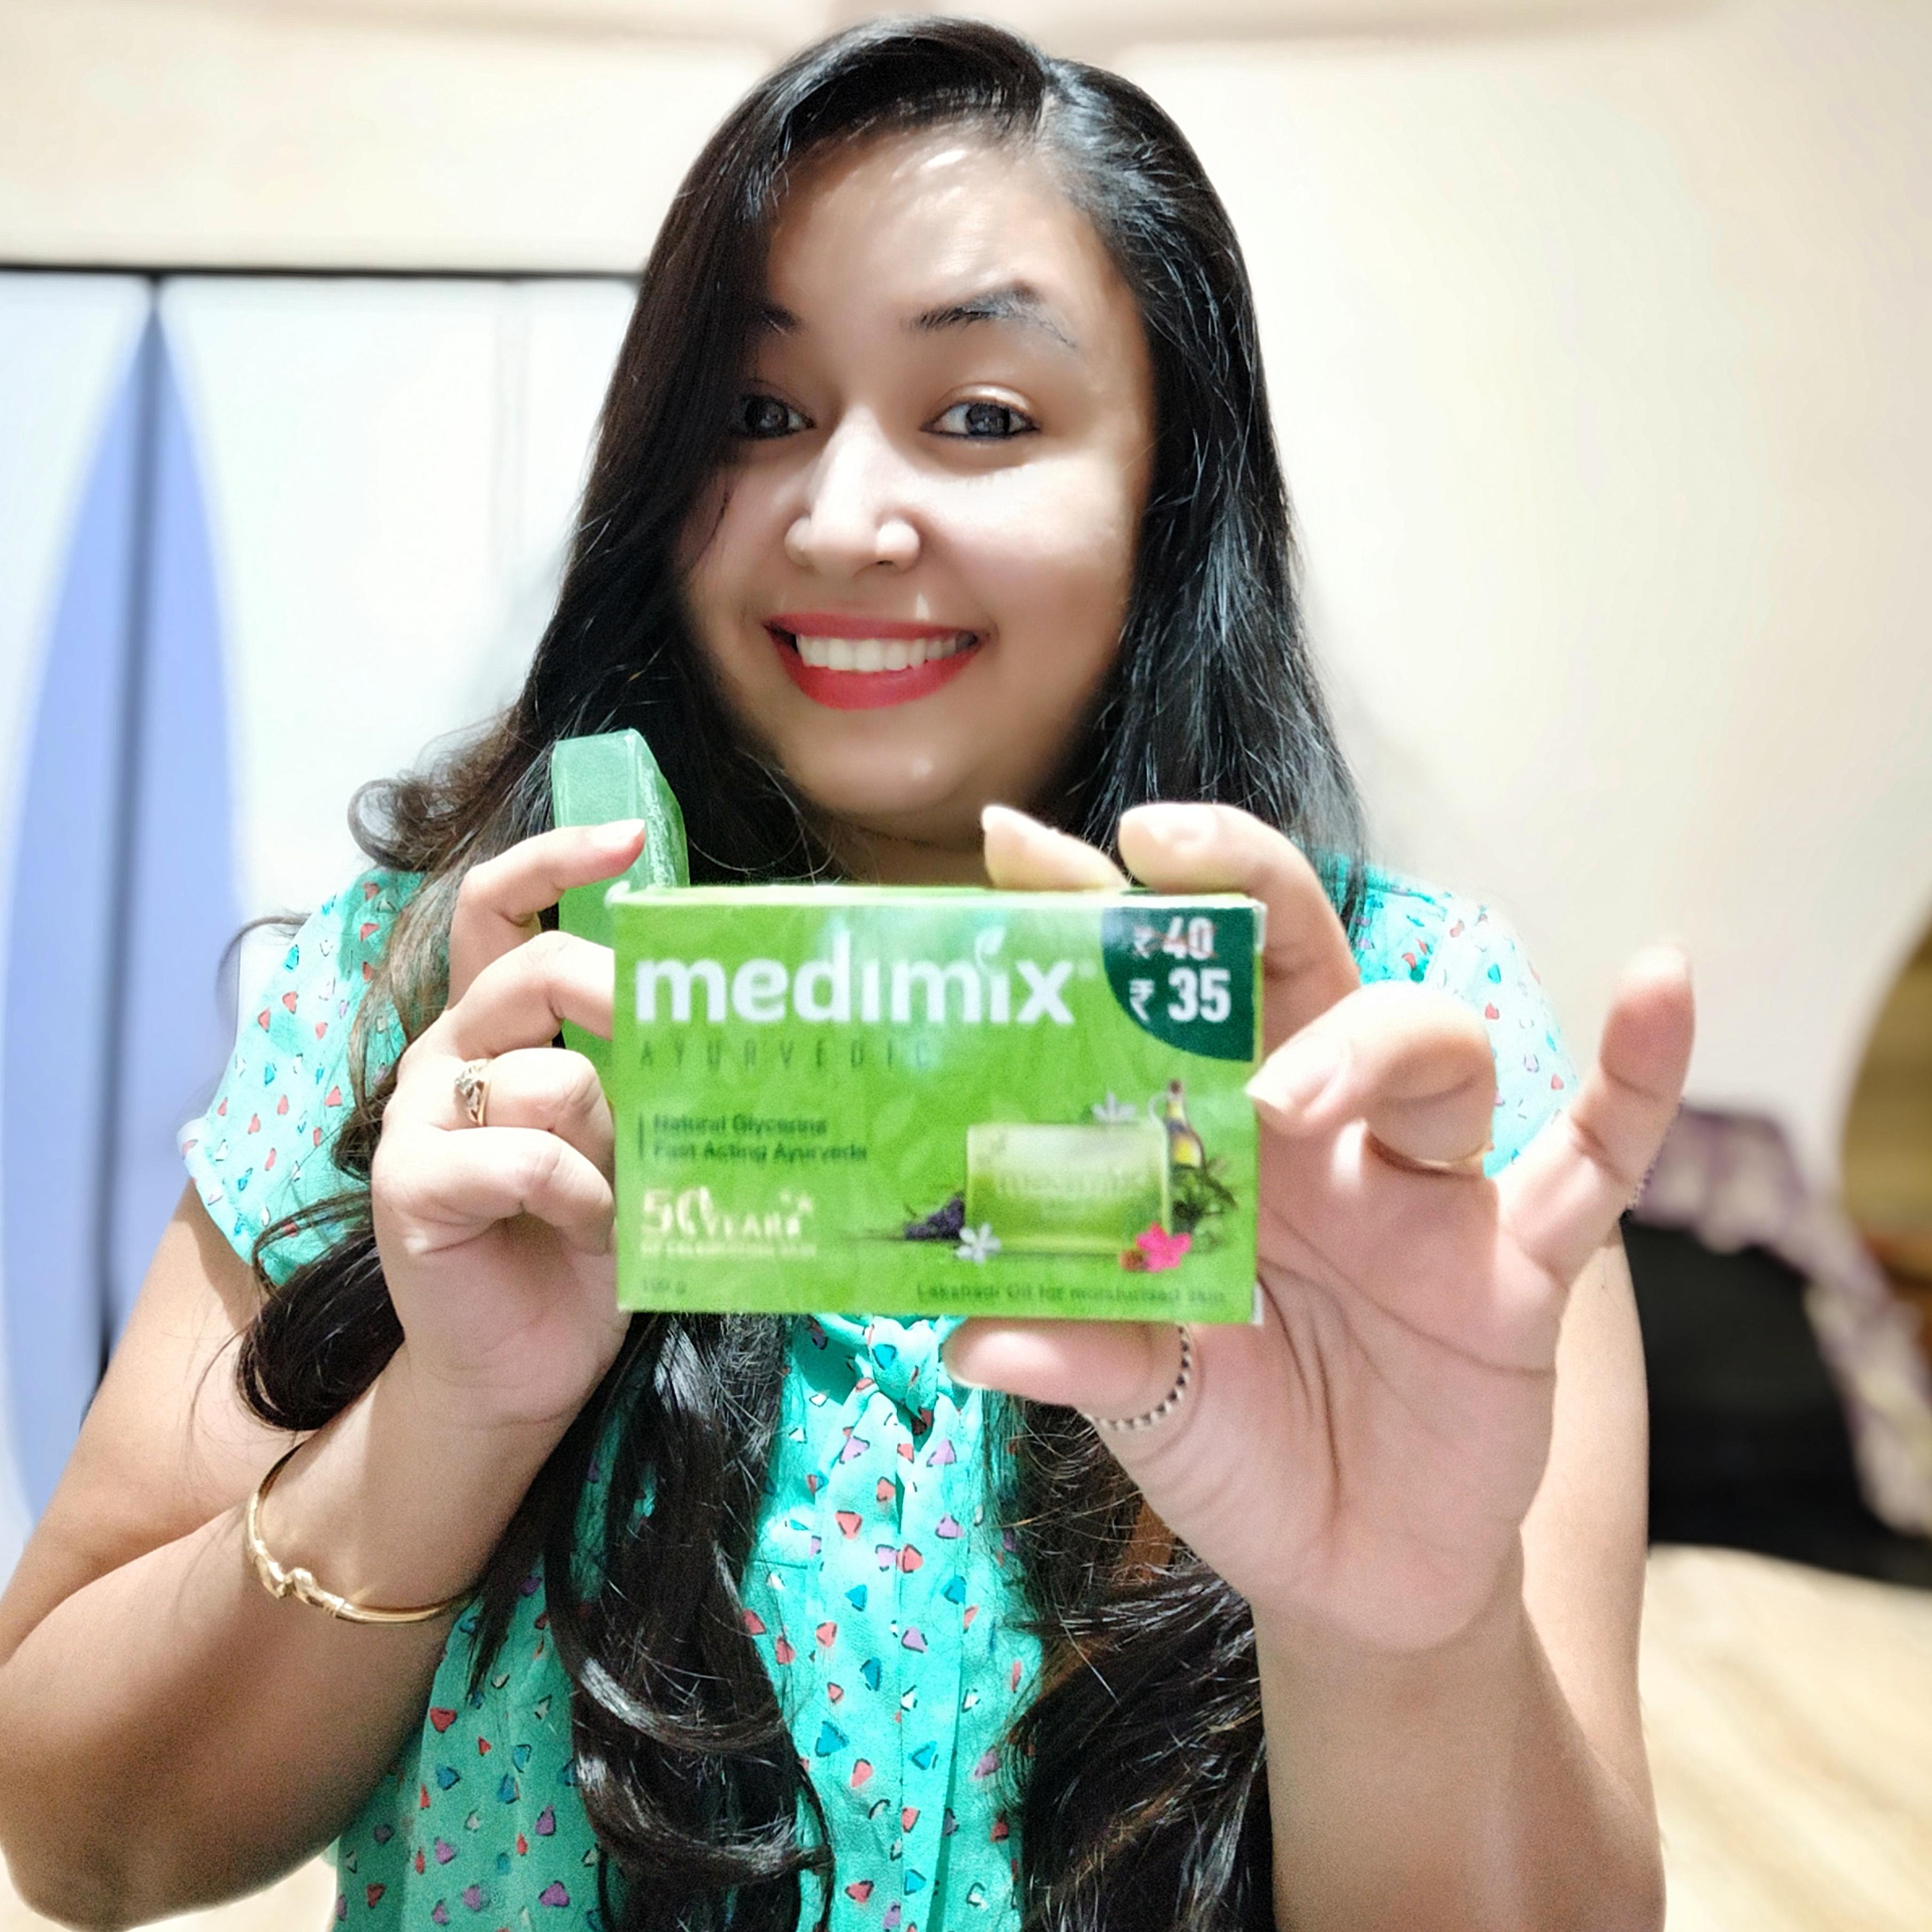 Medimix Ayurvedic Natural Glycerine soap with Lakshadi Oil -Glycerine moisturizing soap-By moma_tales